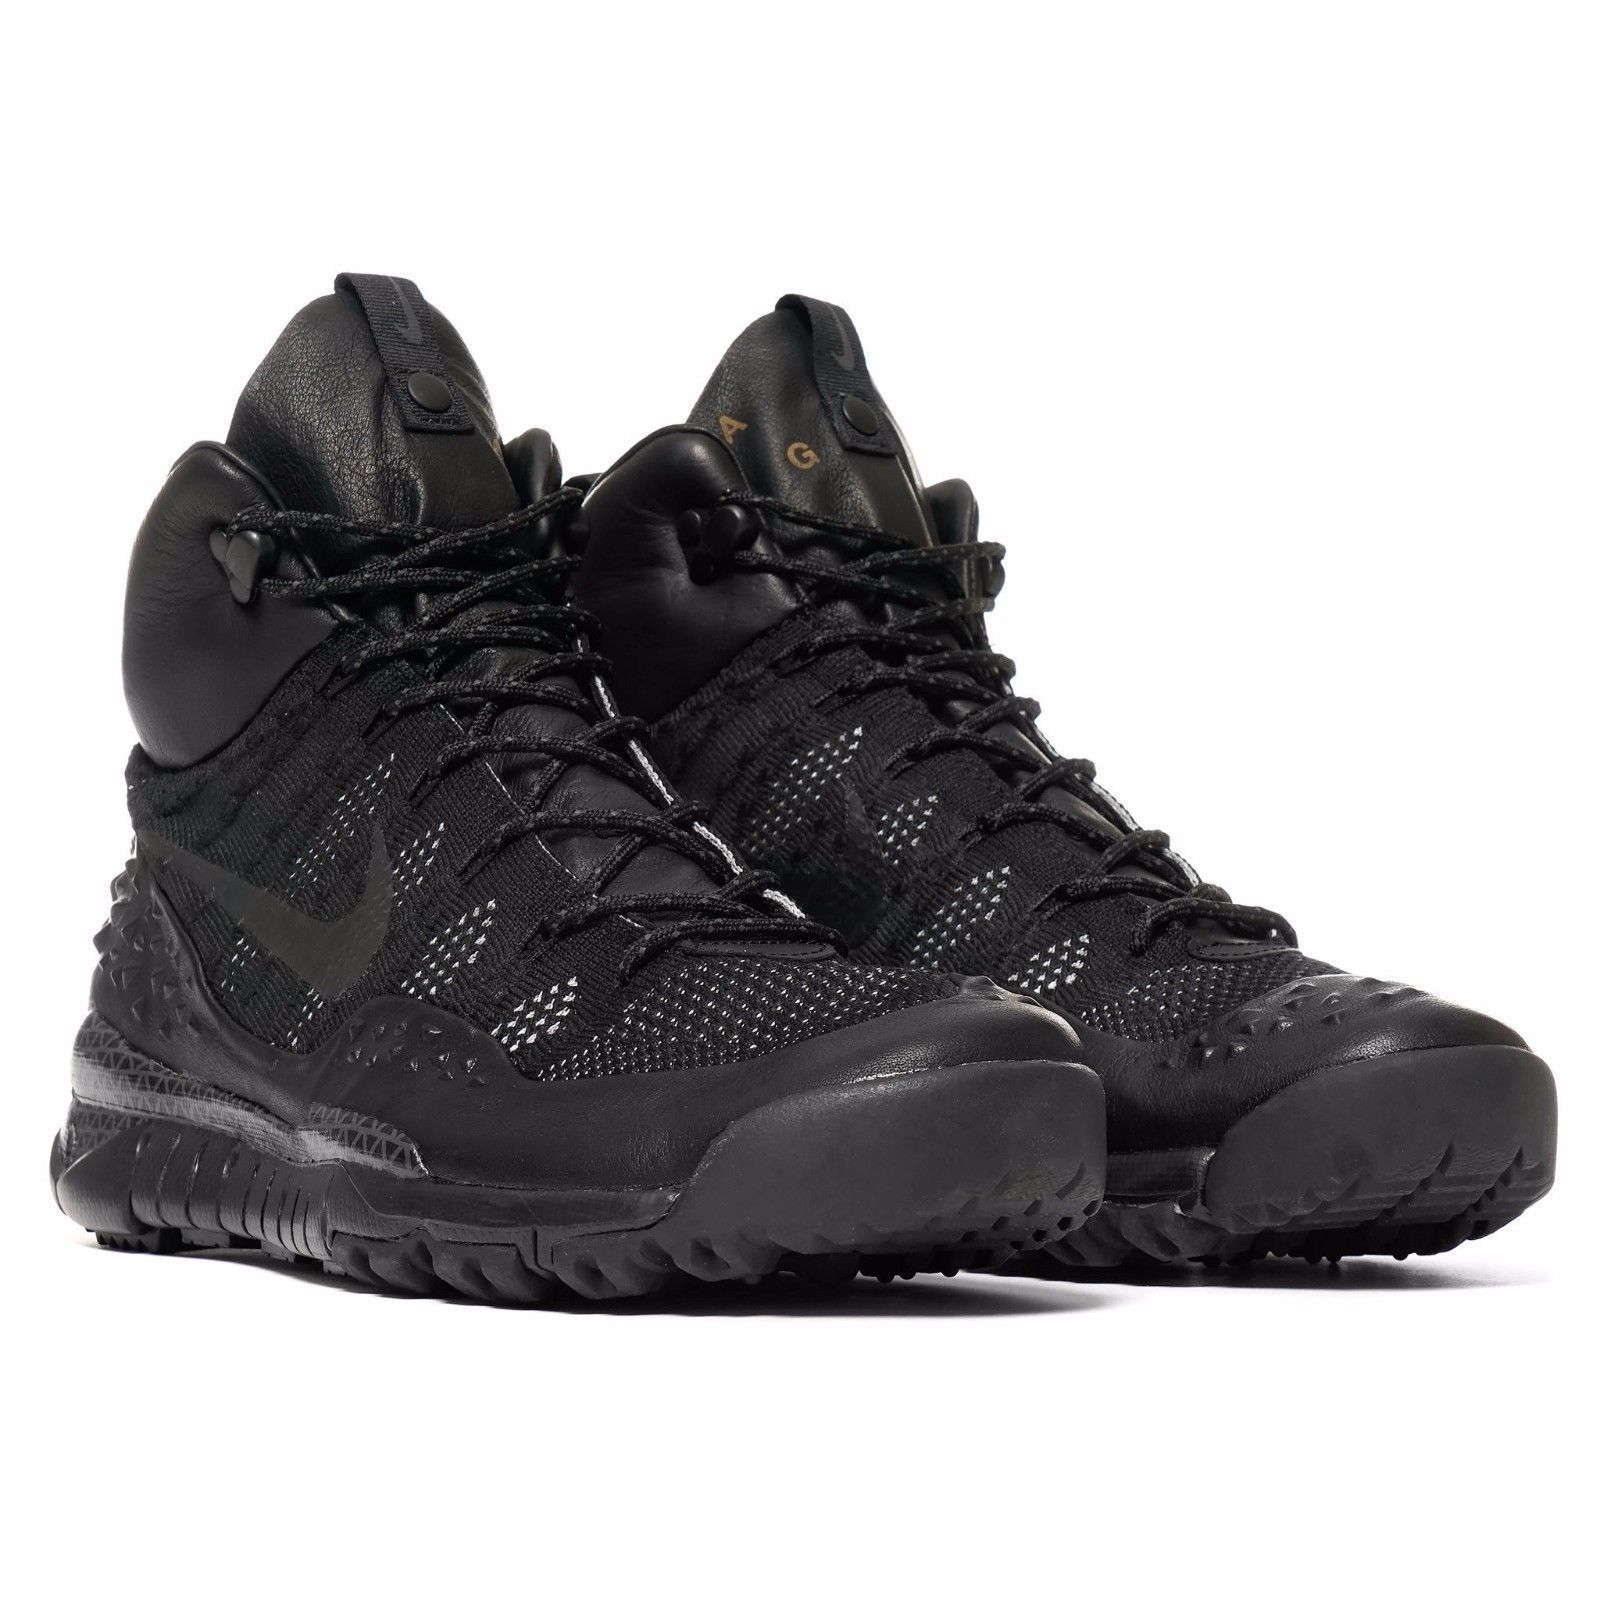 Brand New Mens Nike Lupinek Flyknit ACG 826077001 Black/Anthracite Szs  10 5